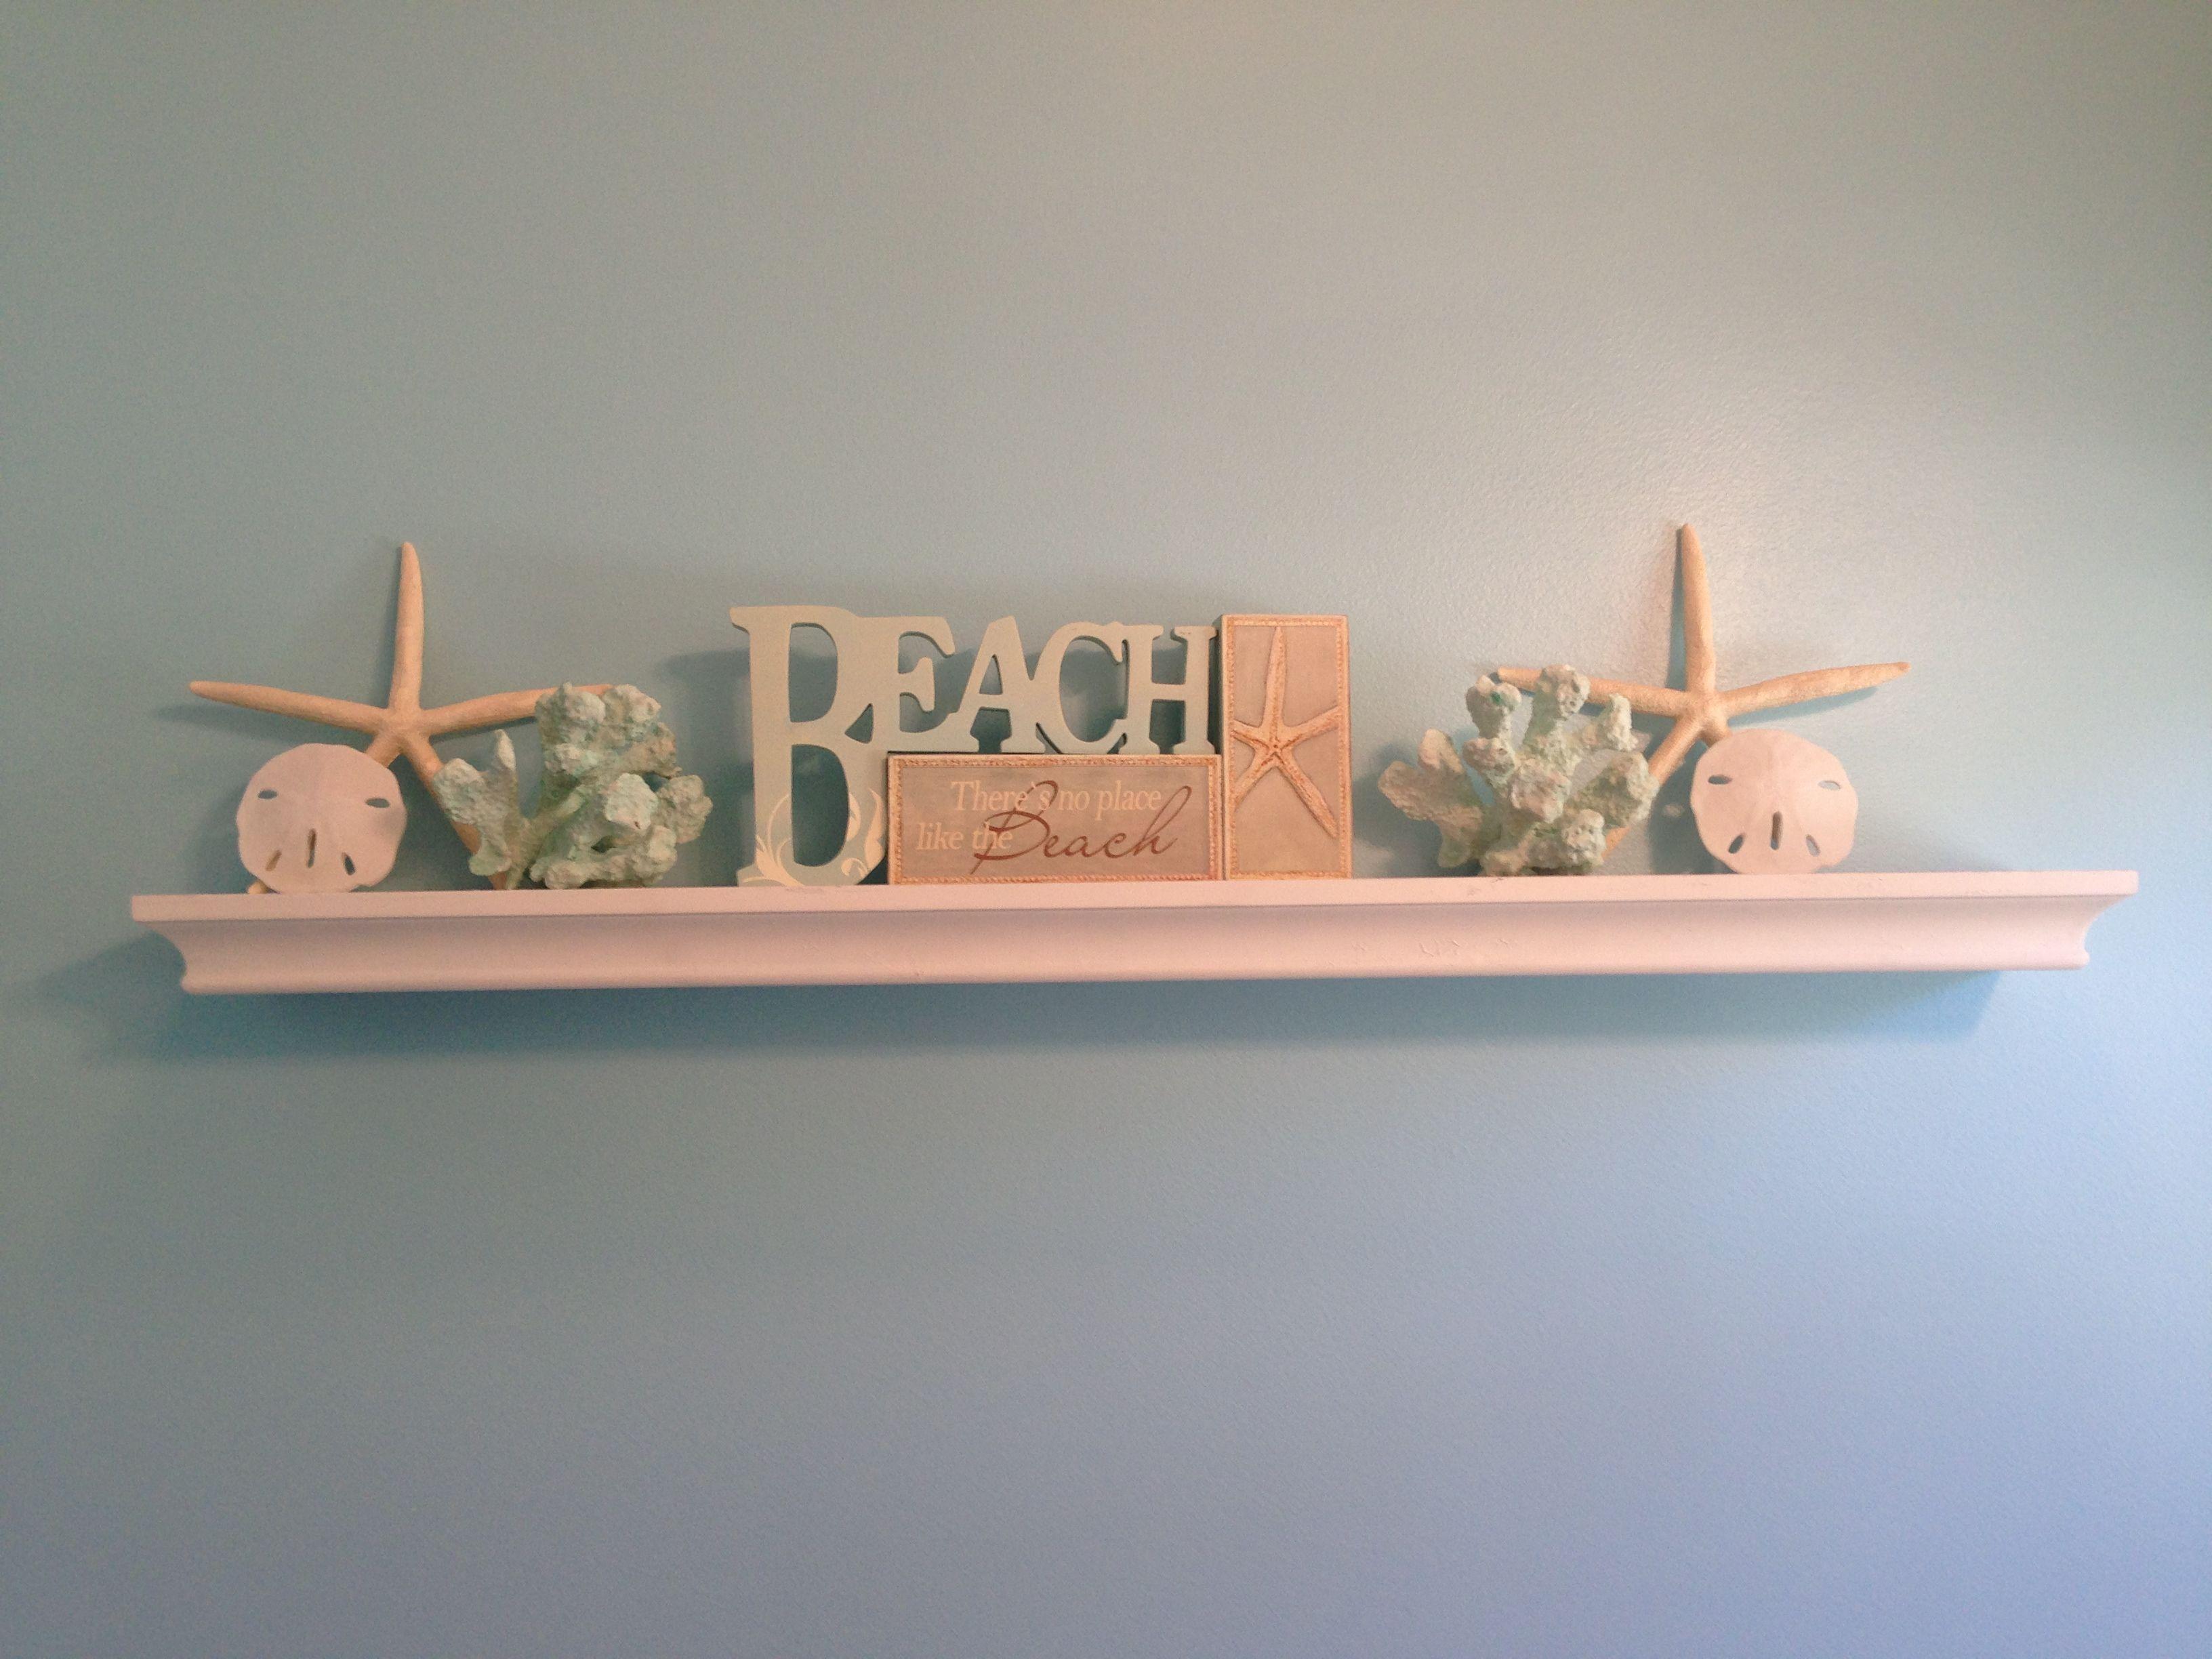 Beach Decor Catalogs